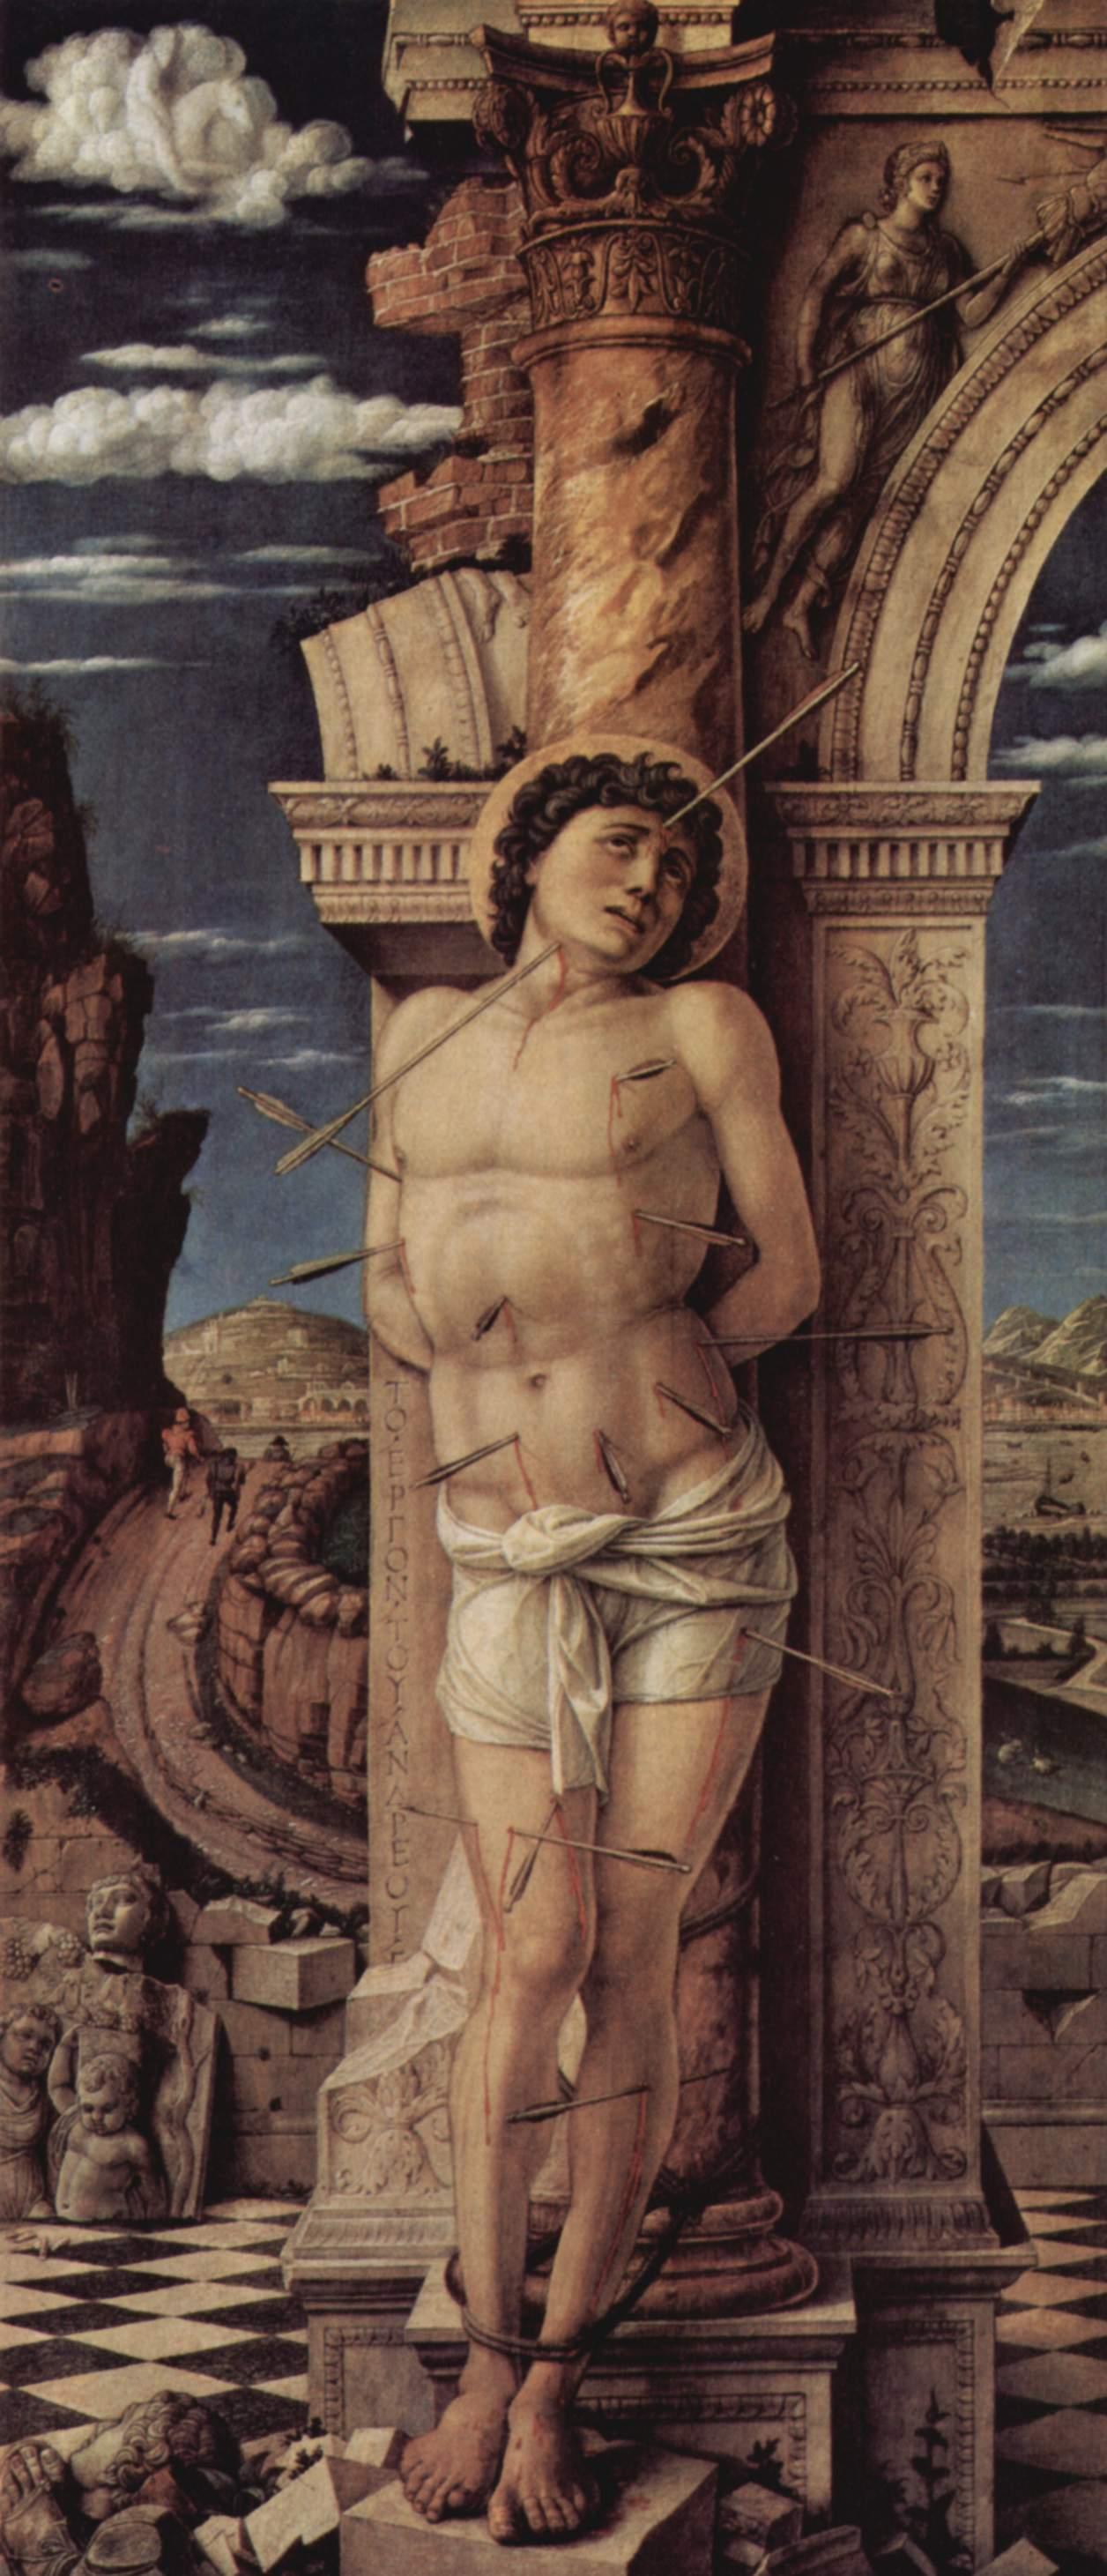 Андреа Мантенья, «Святой Себастьян», 1457-58 гг.